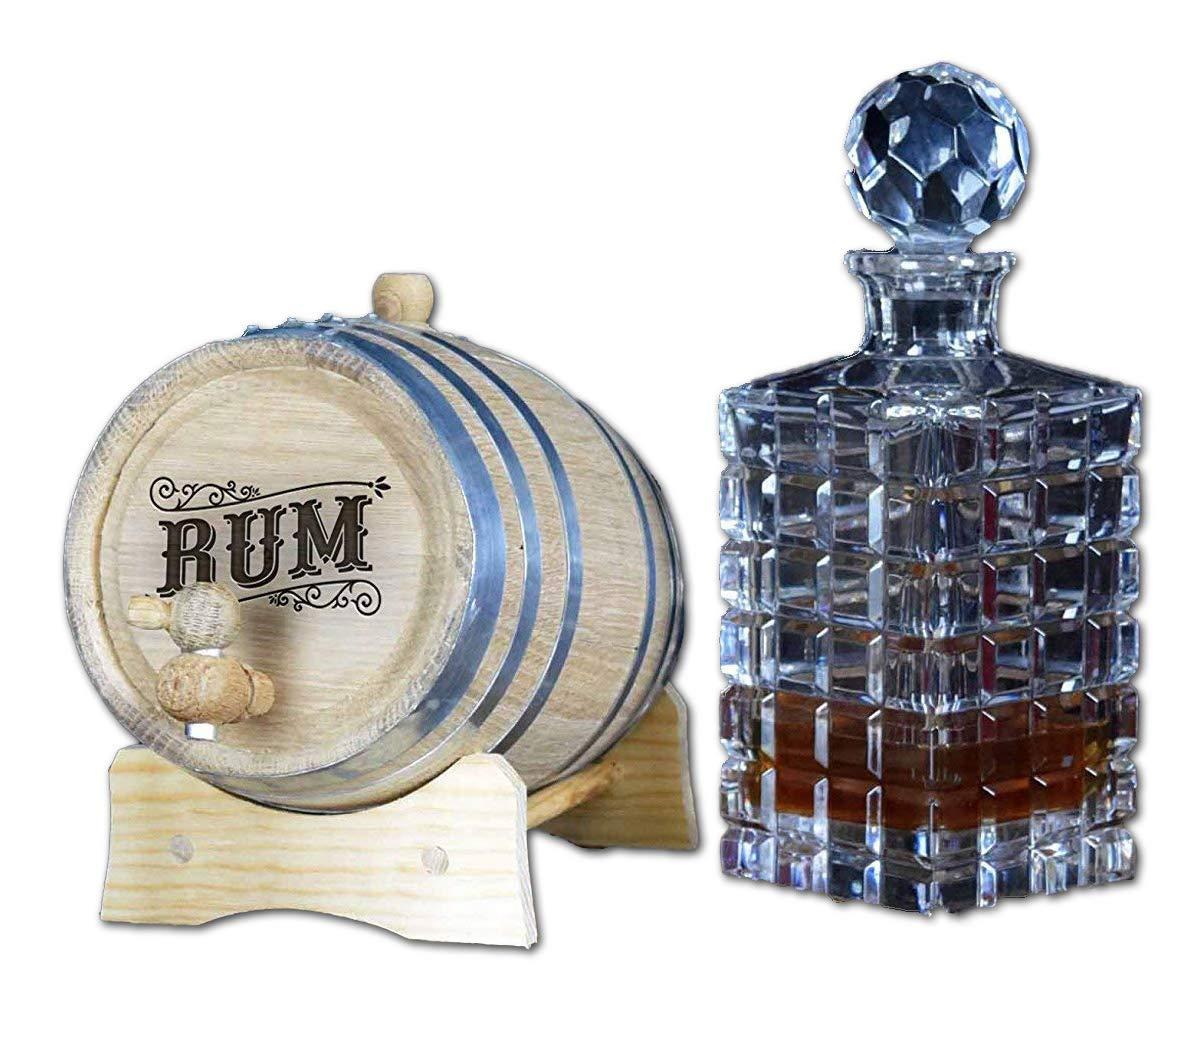 Engraved Rum Barrel (B523) (2 Liter)